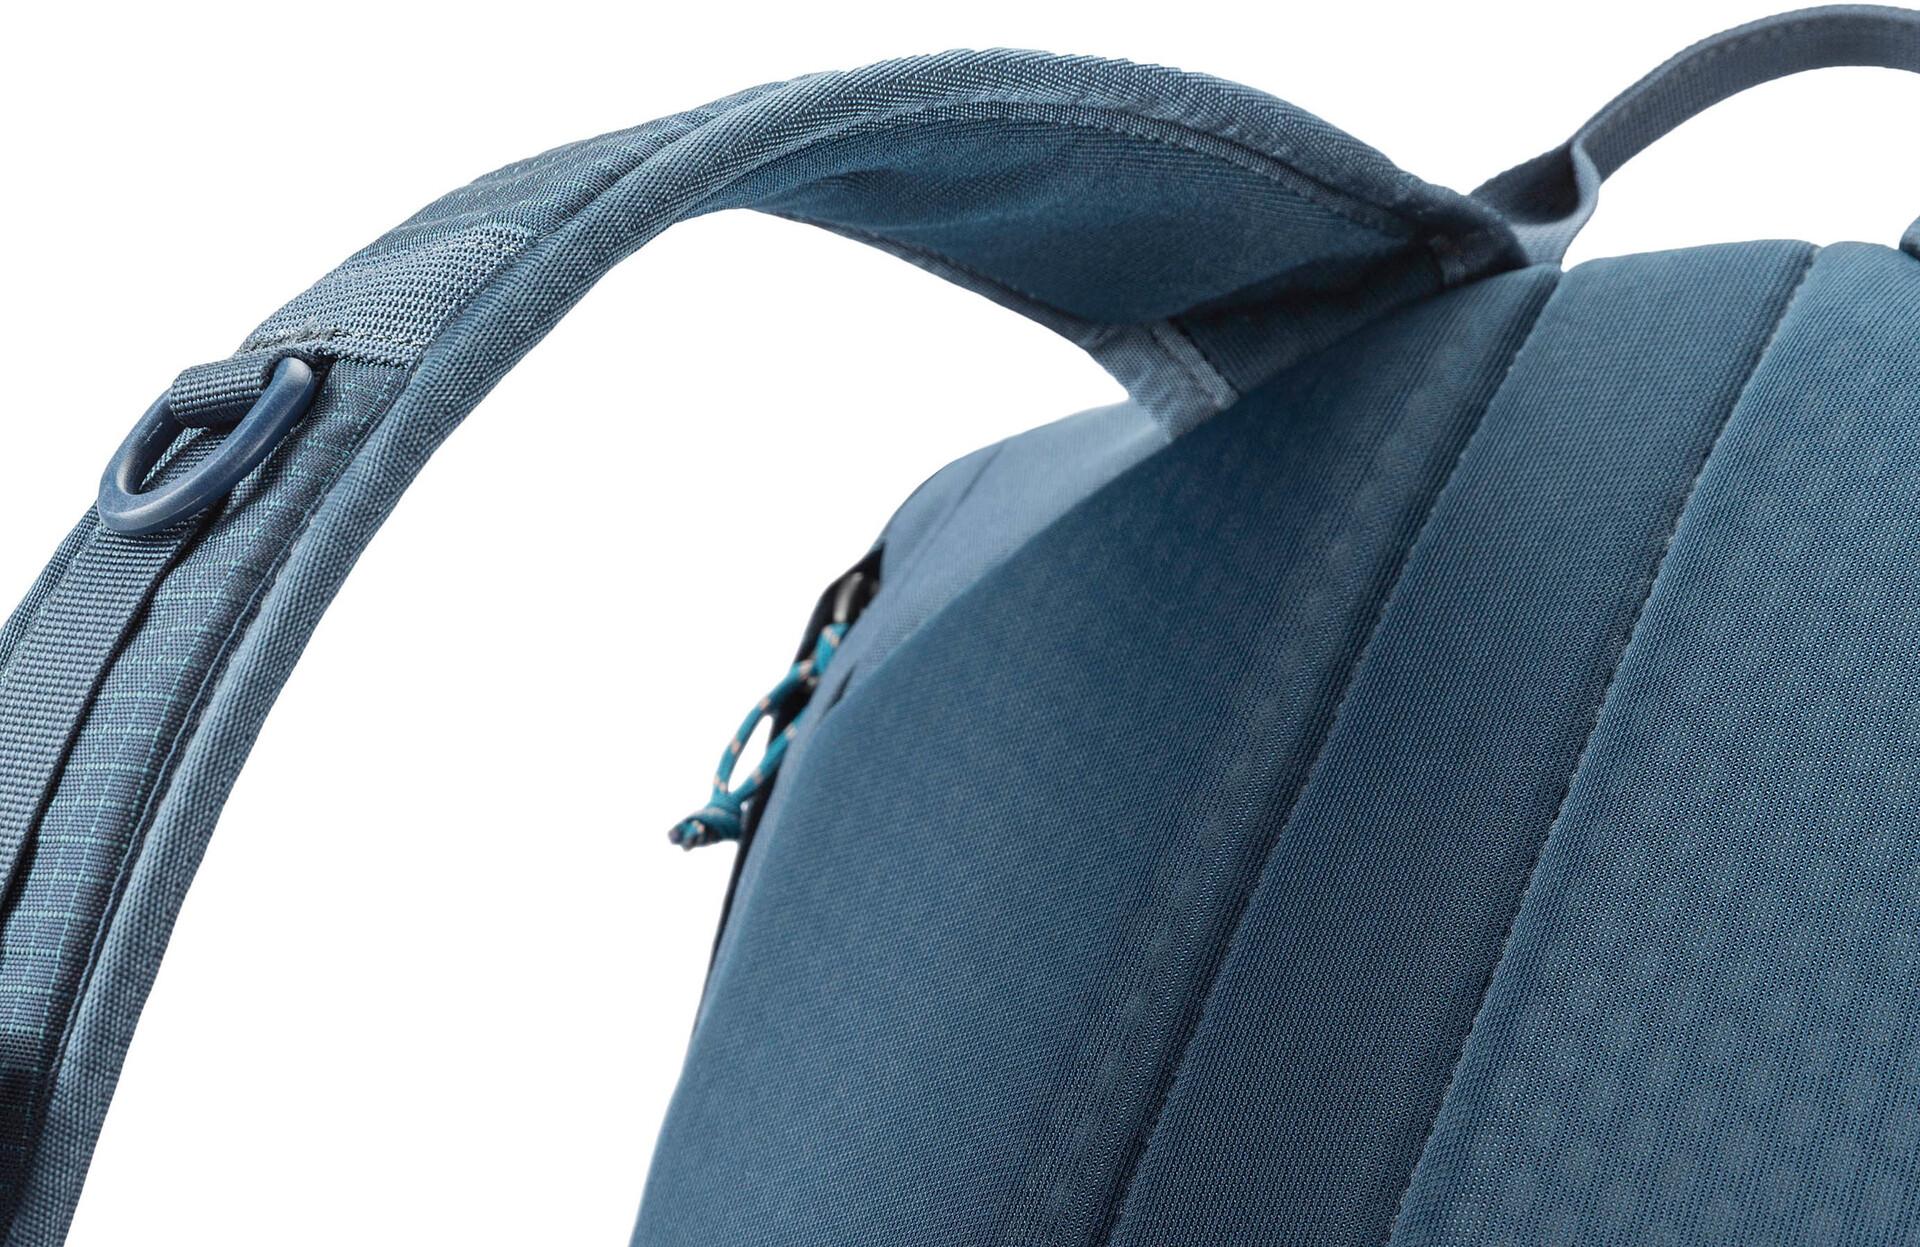 Mammut Klettergurt Baffin : Gregory baffin backpack midnight blue campz